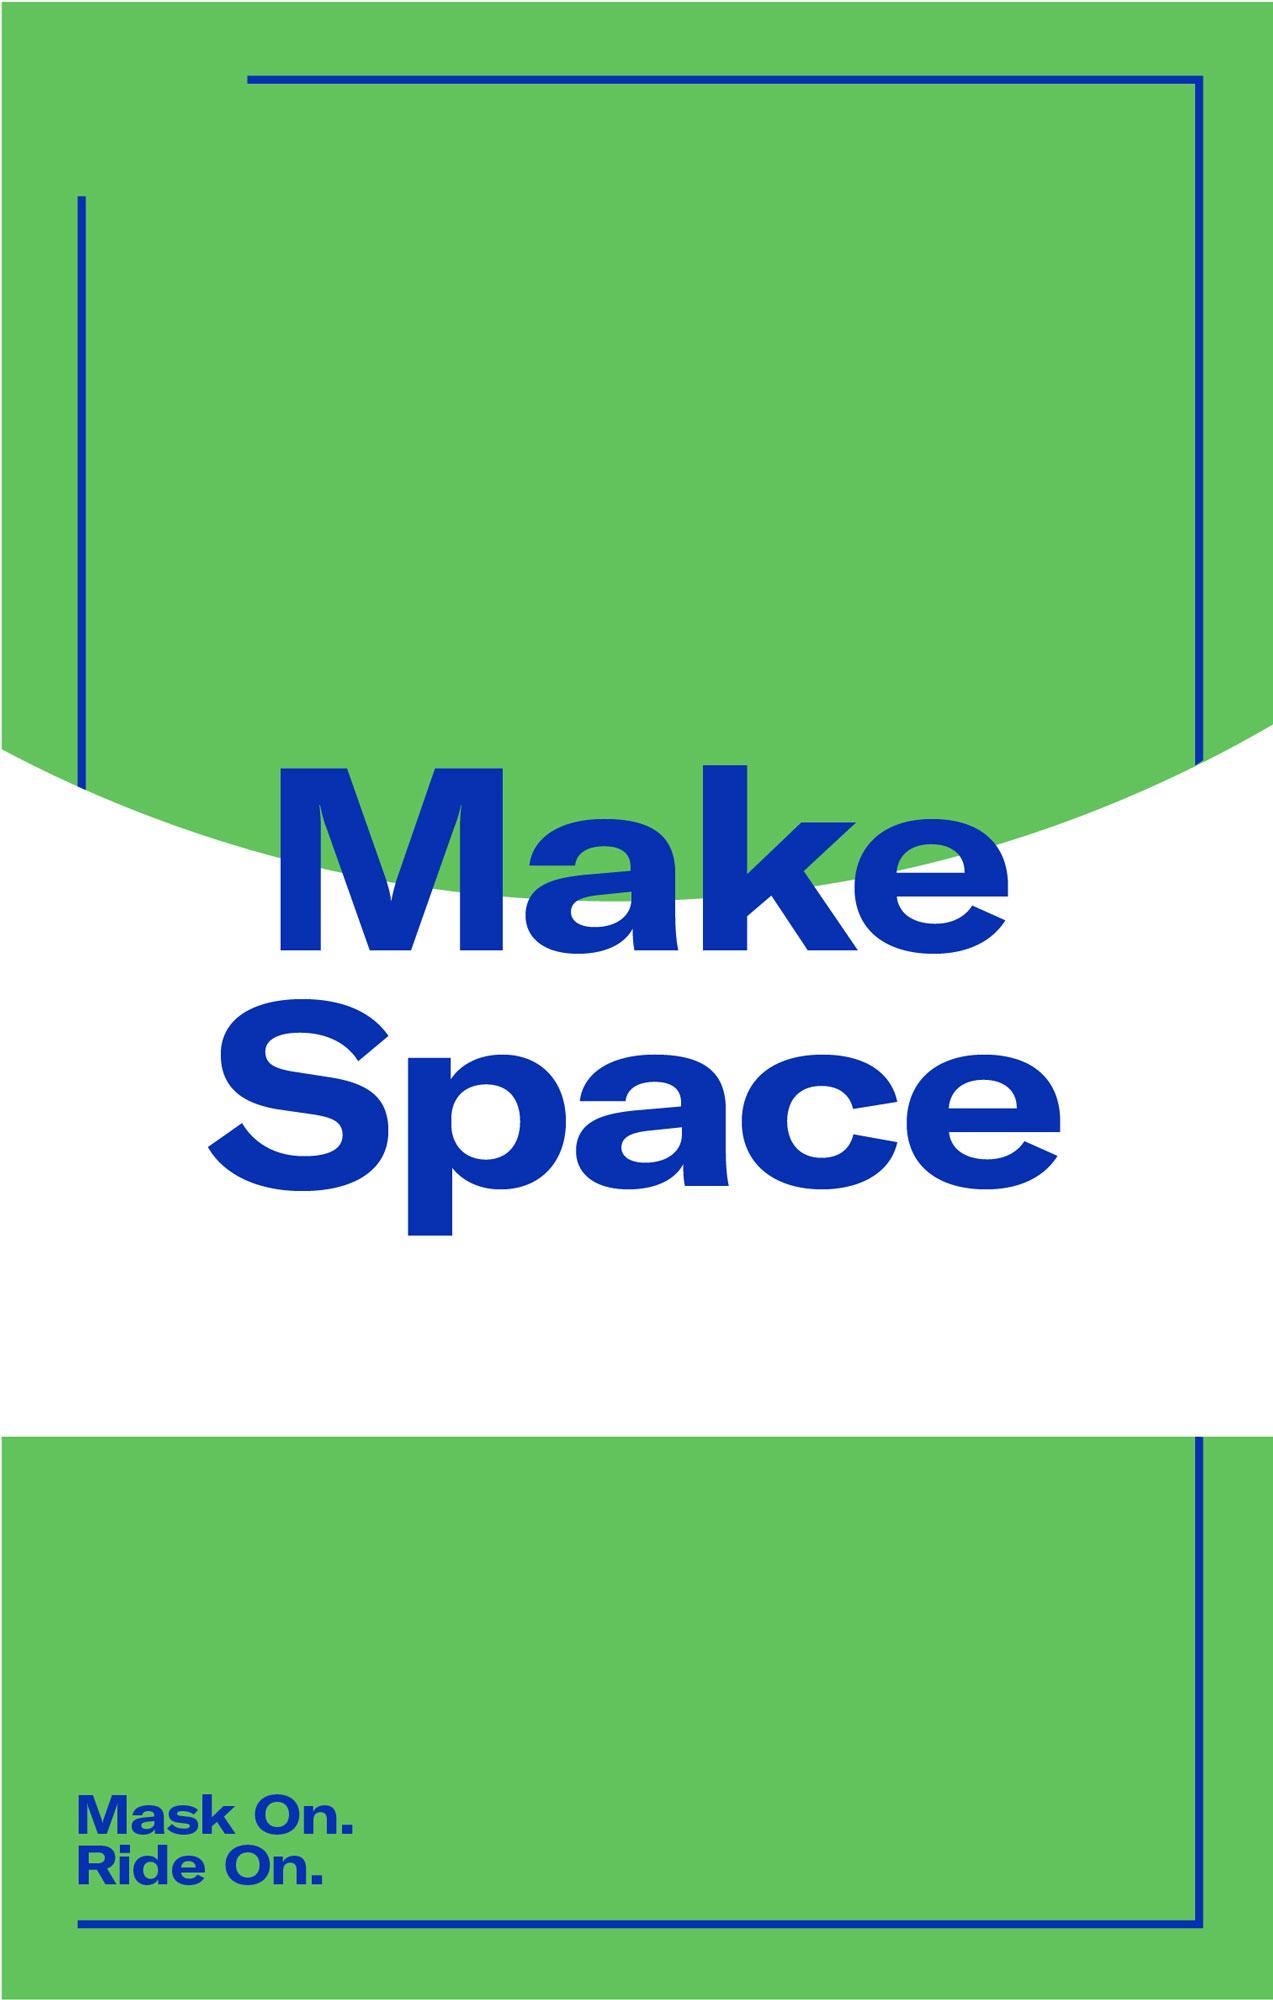 MaskSpace-masked